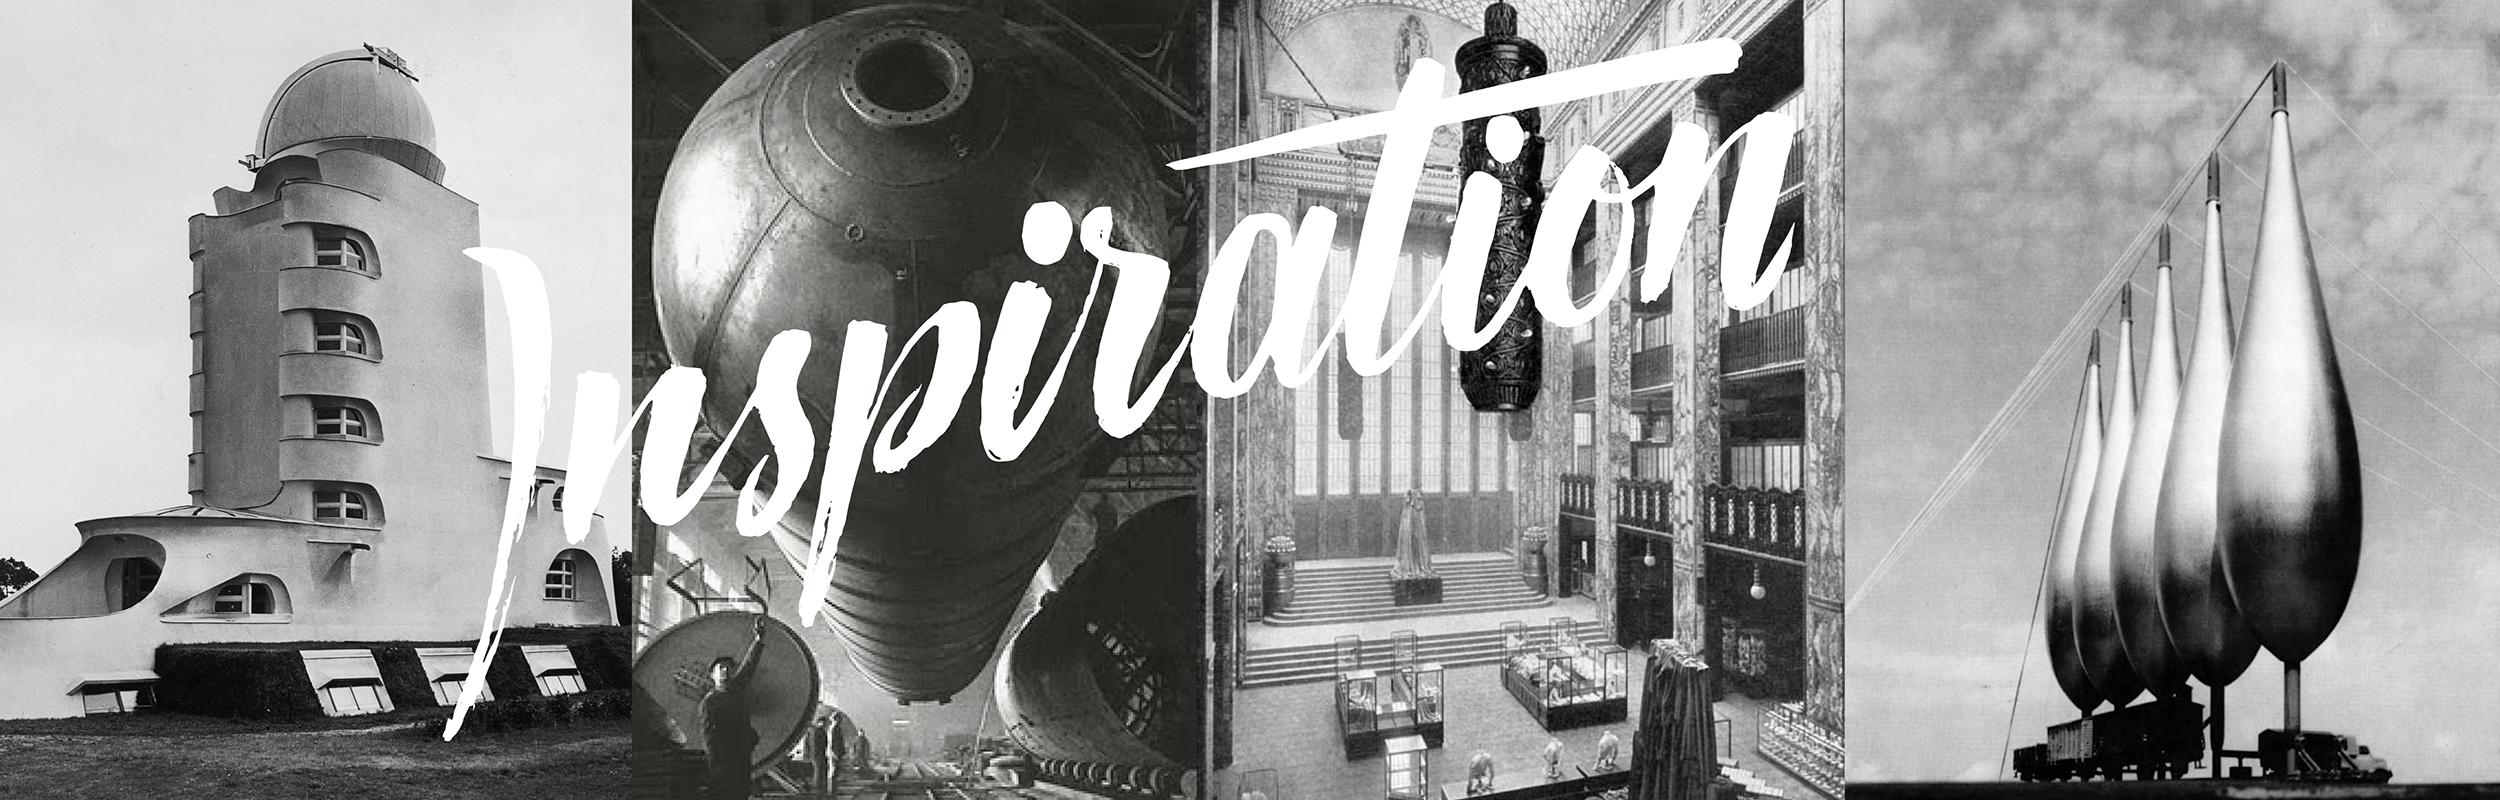 Fabrikat Über uns Inspiration